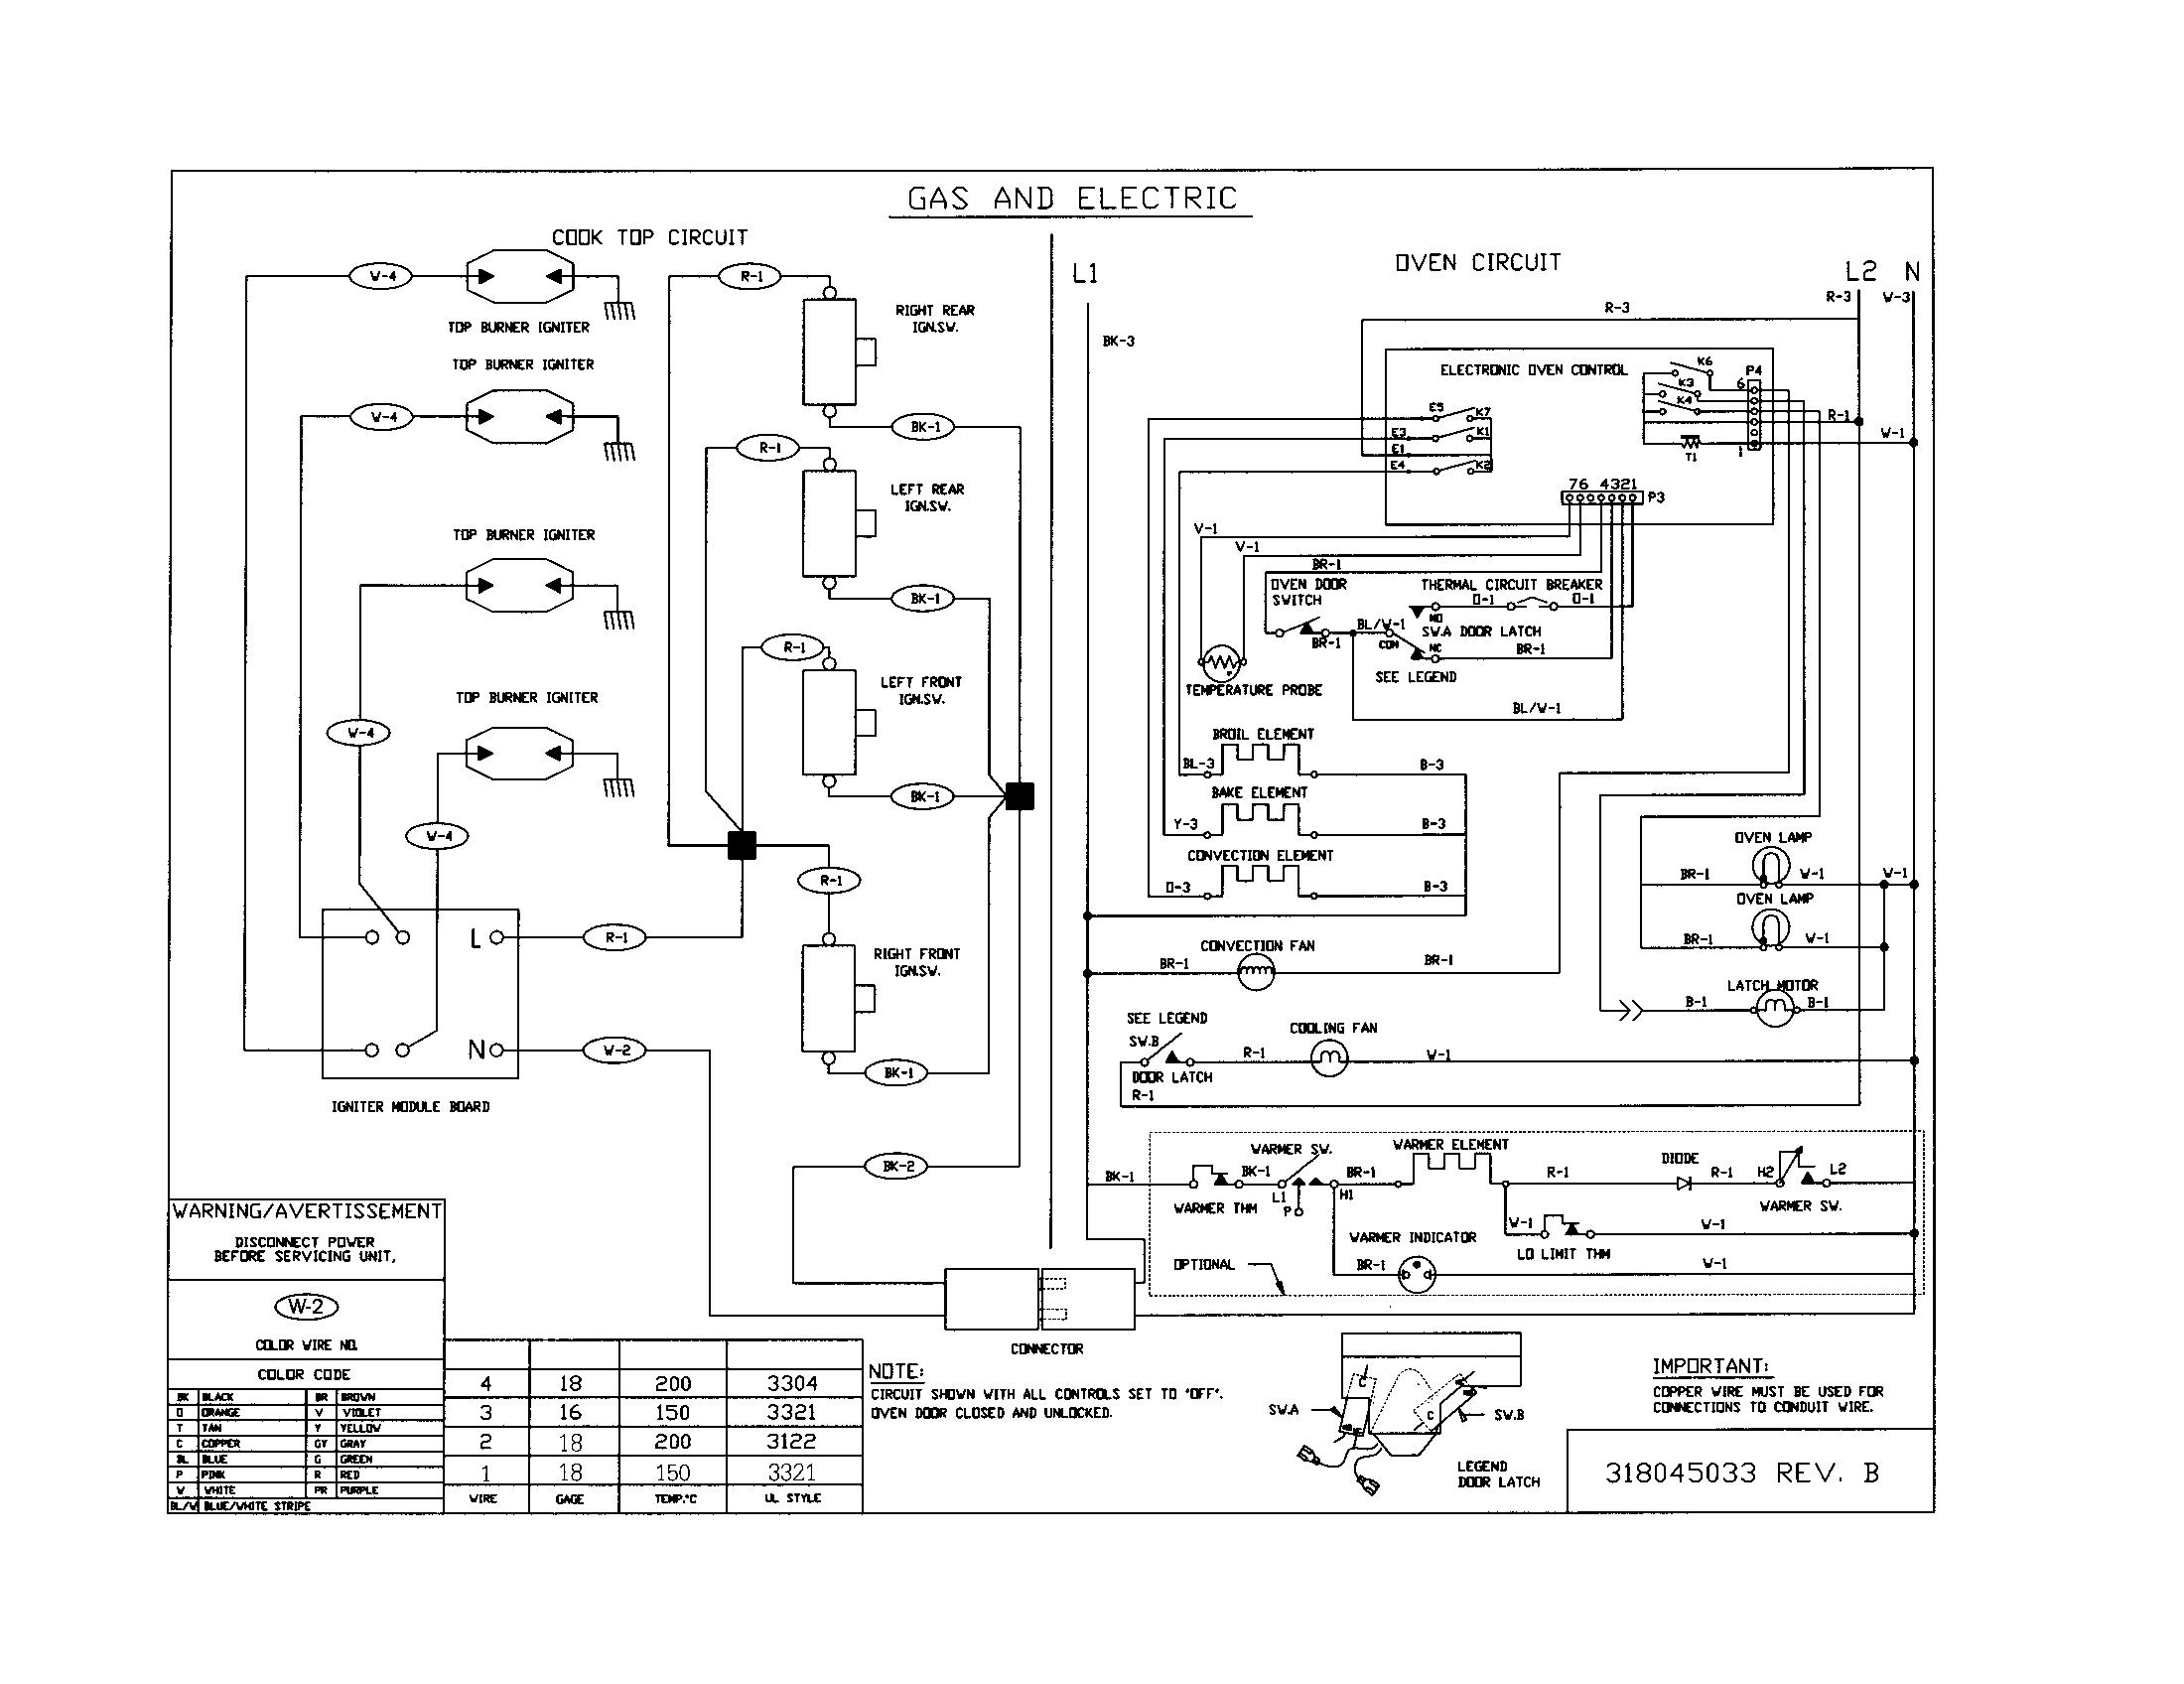 samsung dryer wiring diagram os 5219  wiring diagram for kenmore elite electric dryer get free samsung dryer wiring schematic wiring diagram for kenmore elite